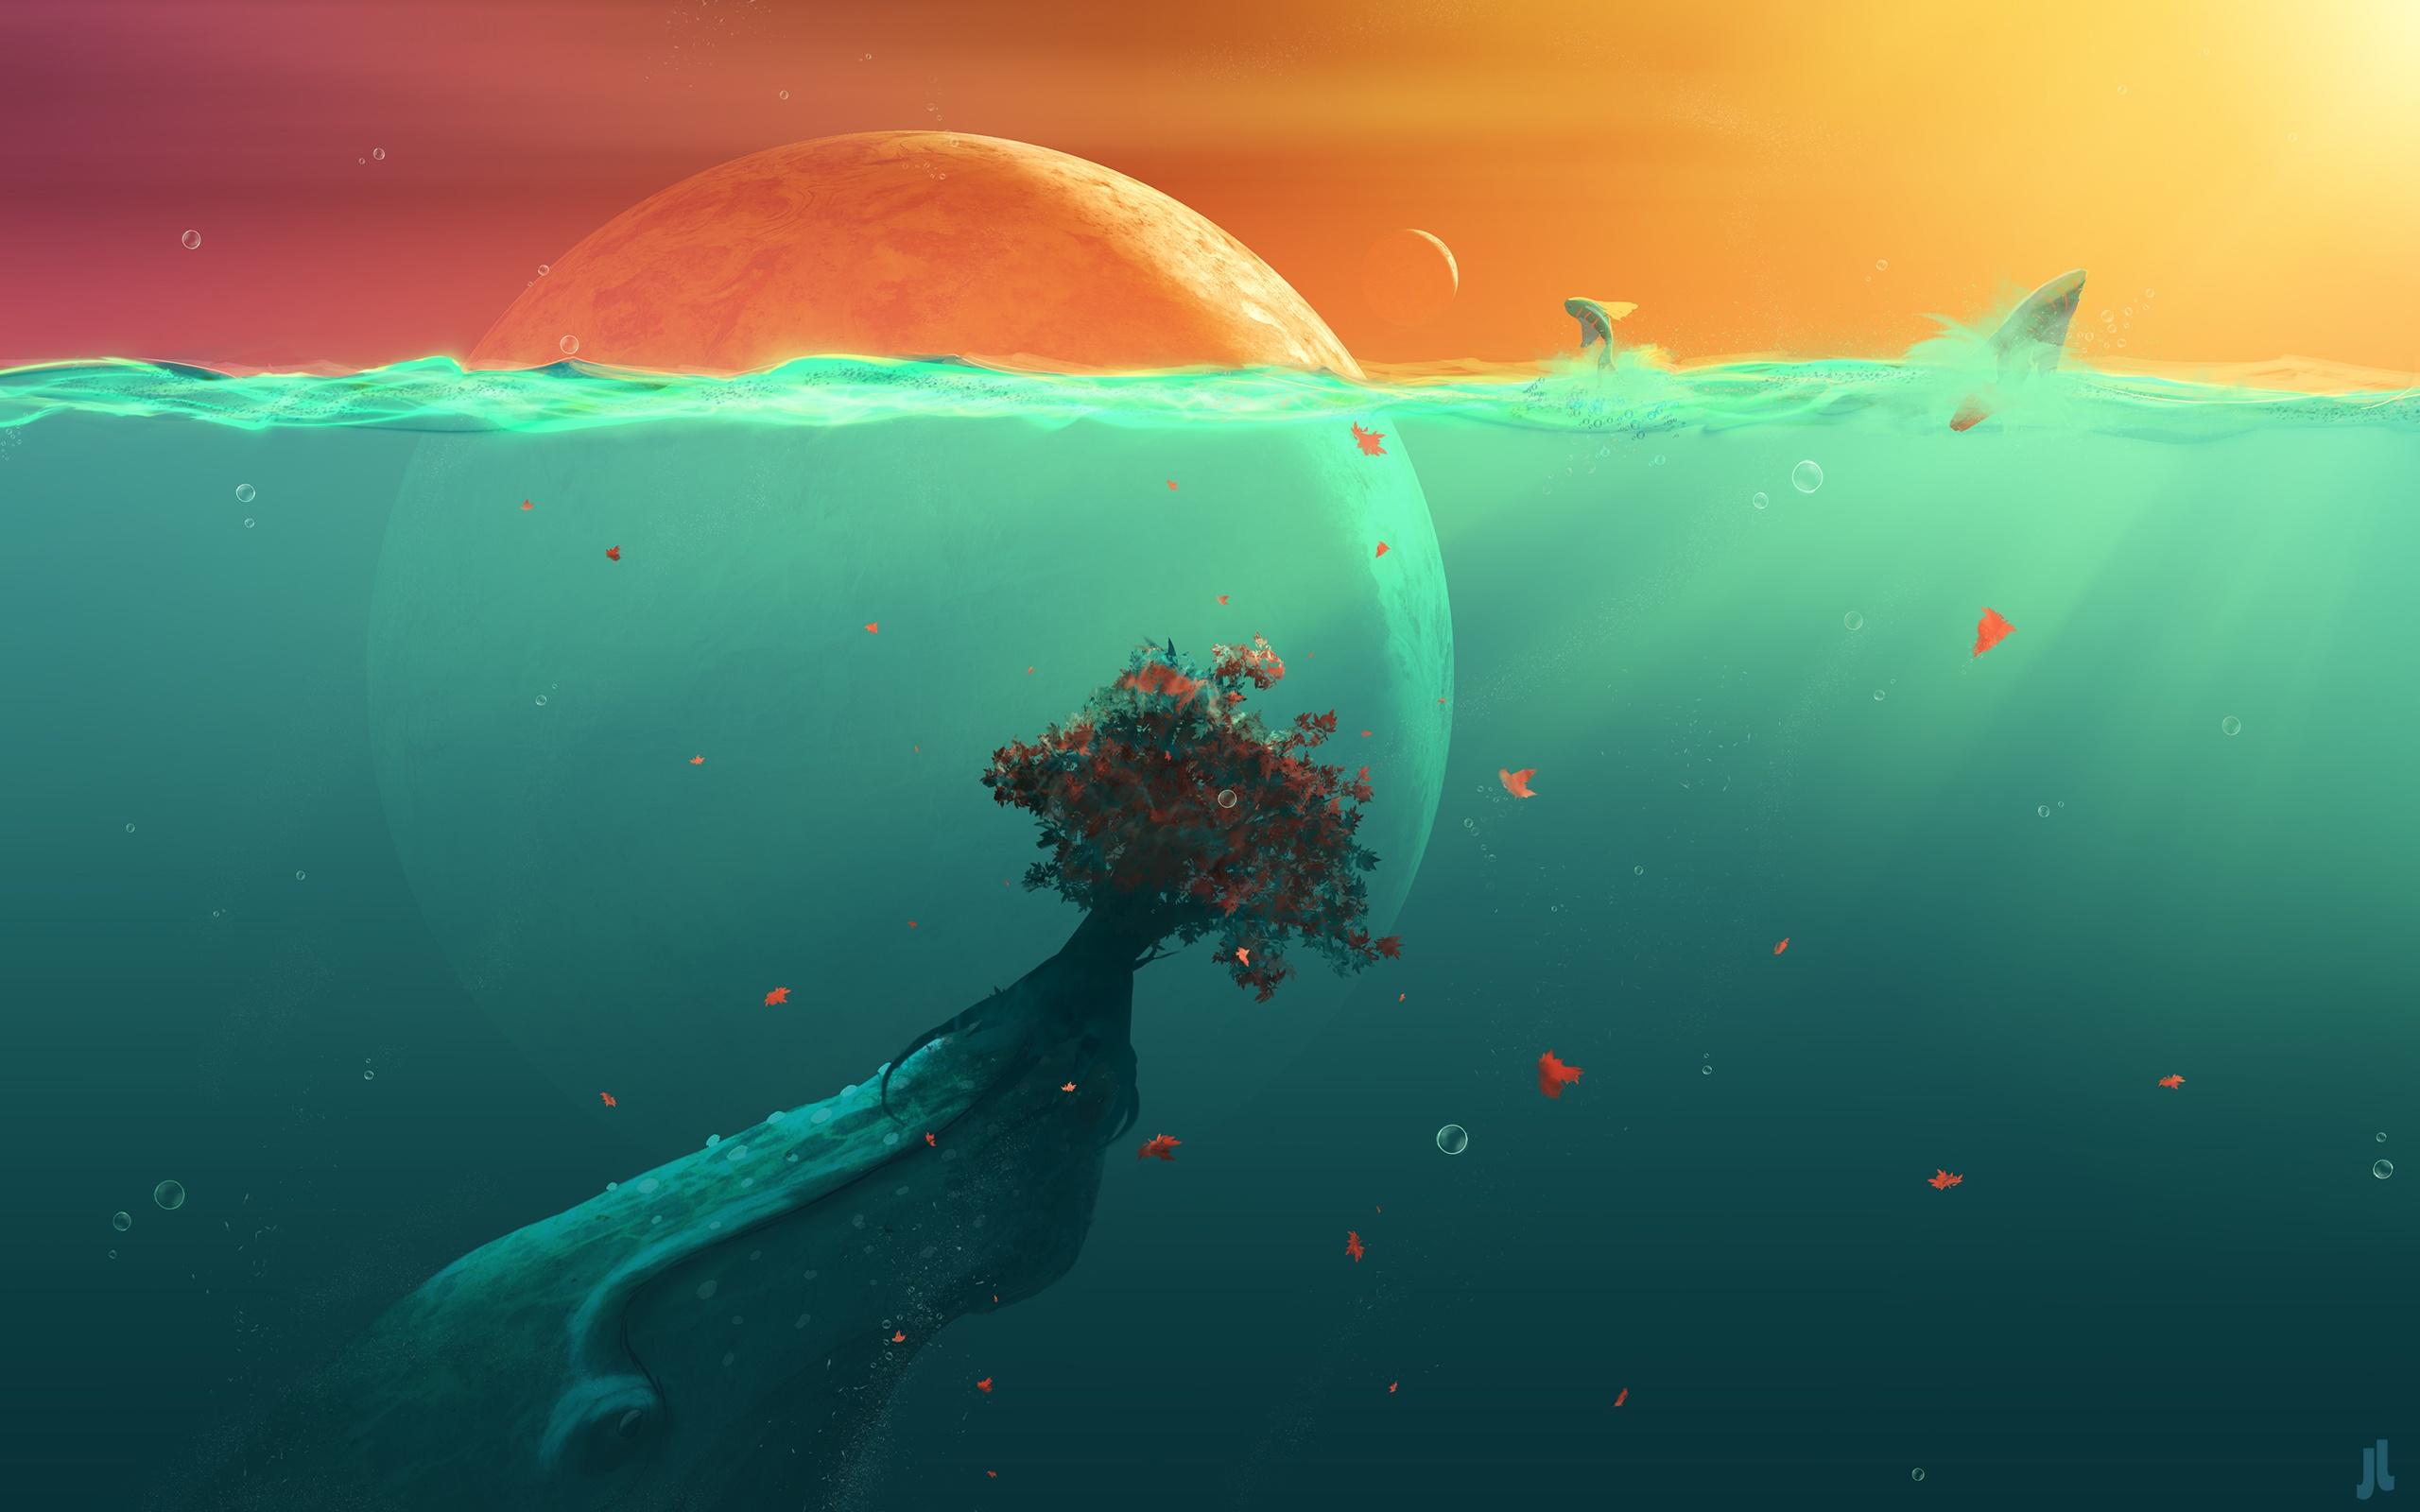 Water Ocean Sun Sea Planets Alien Landscapes Wallpaper At 3d ...